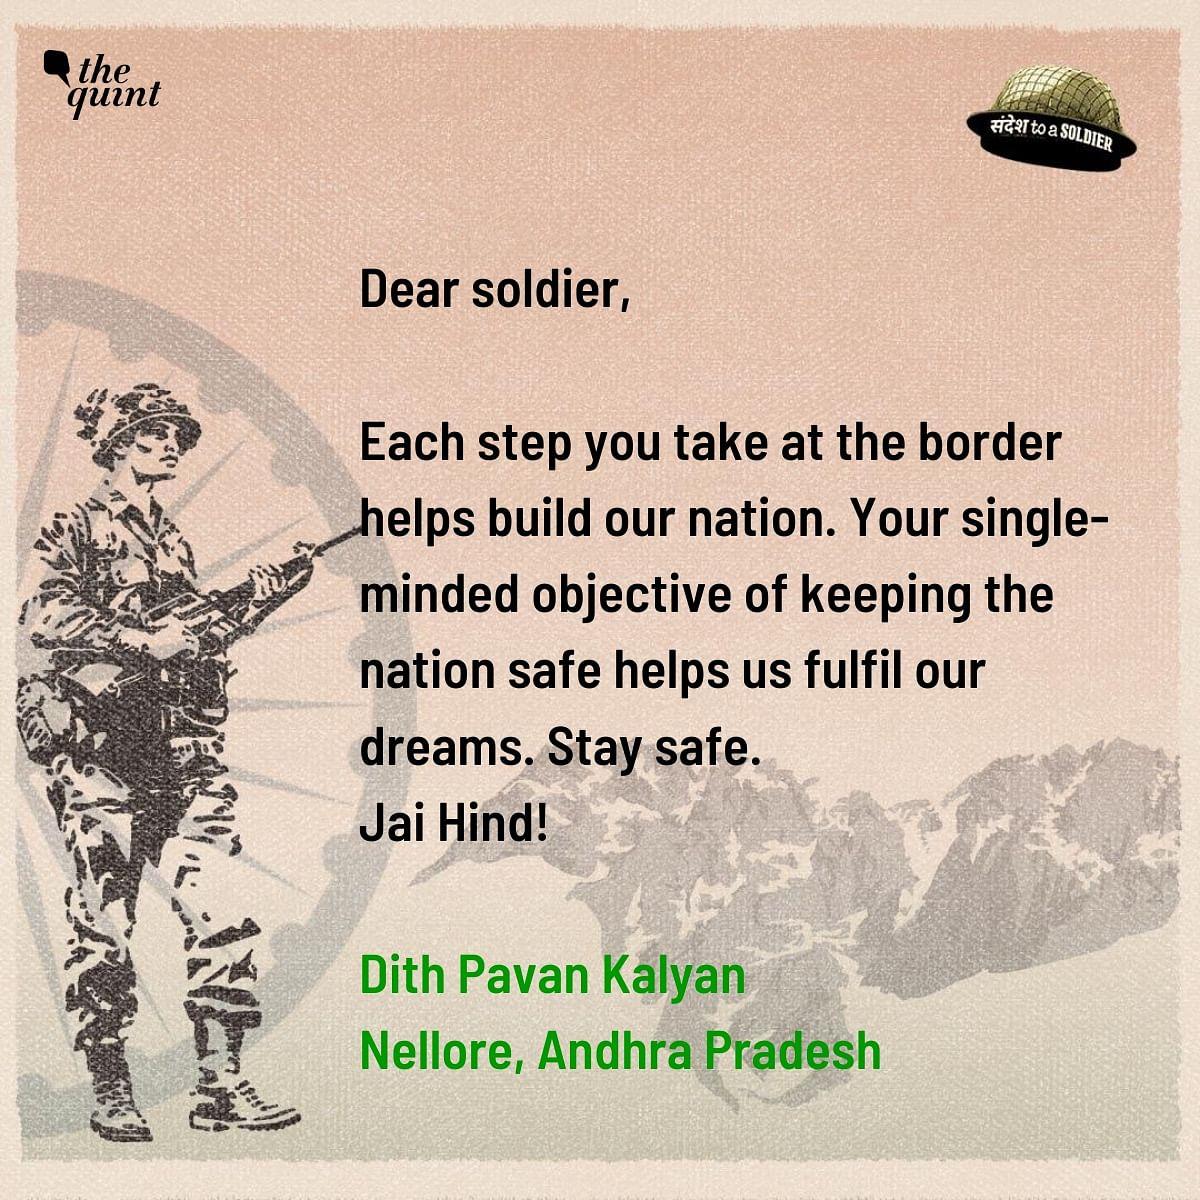 Dith Pavan Kalyan from Andhra Pradesh sends his sandesh to a soldier.